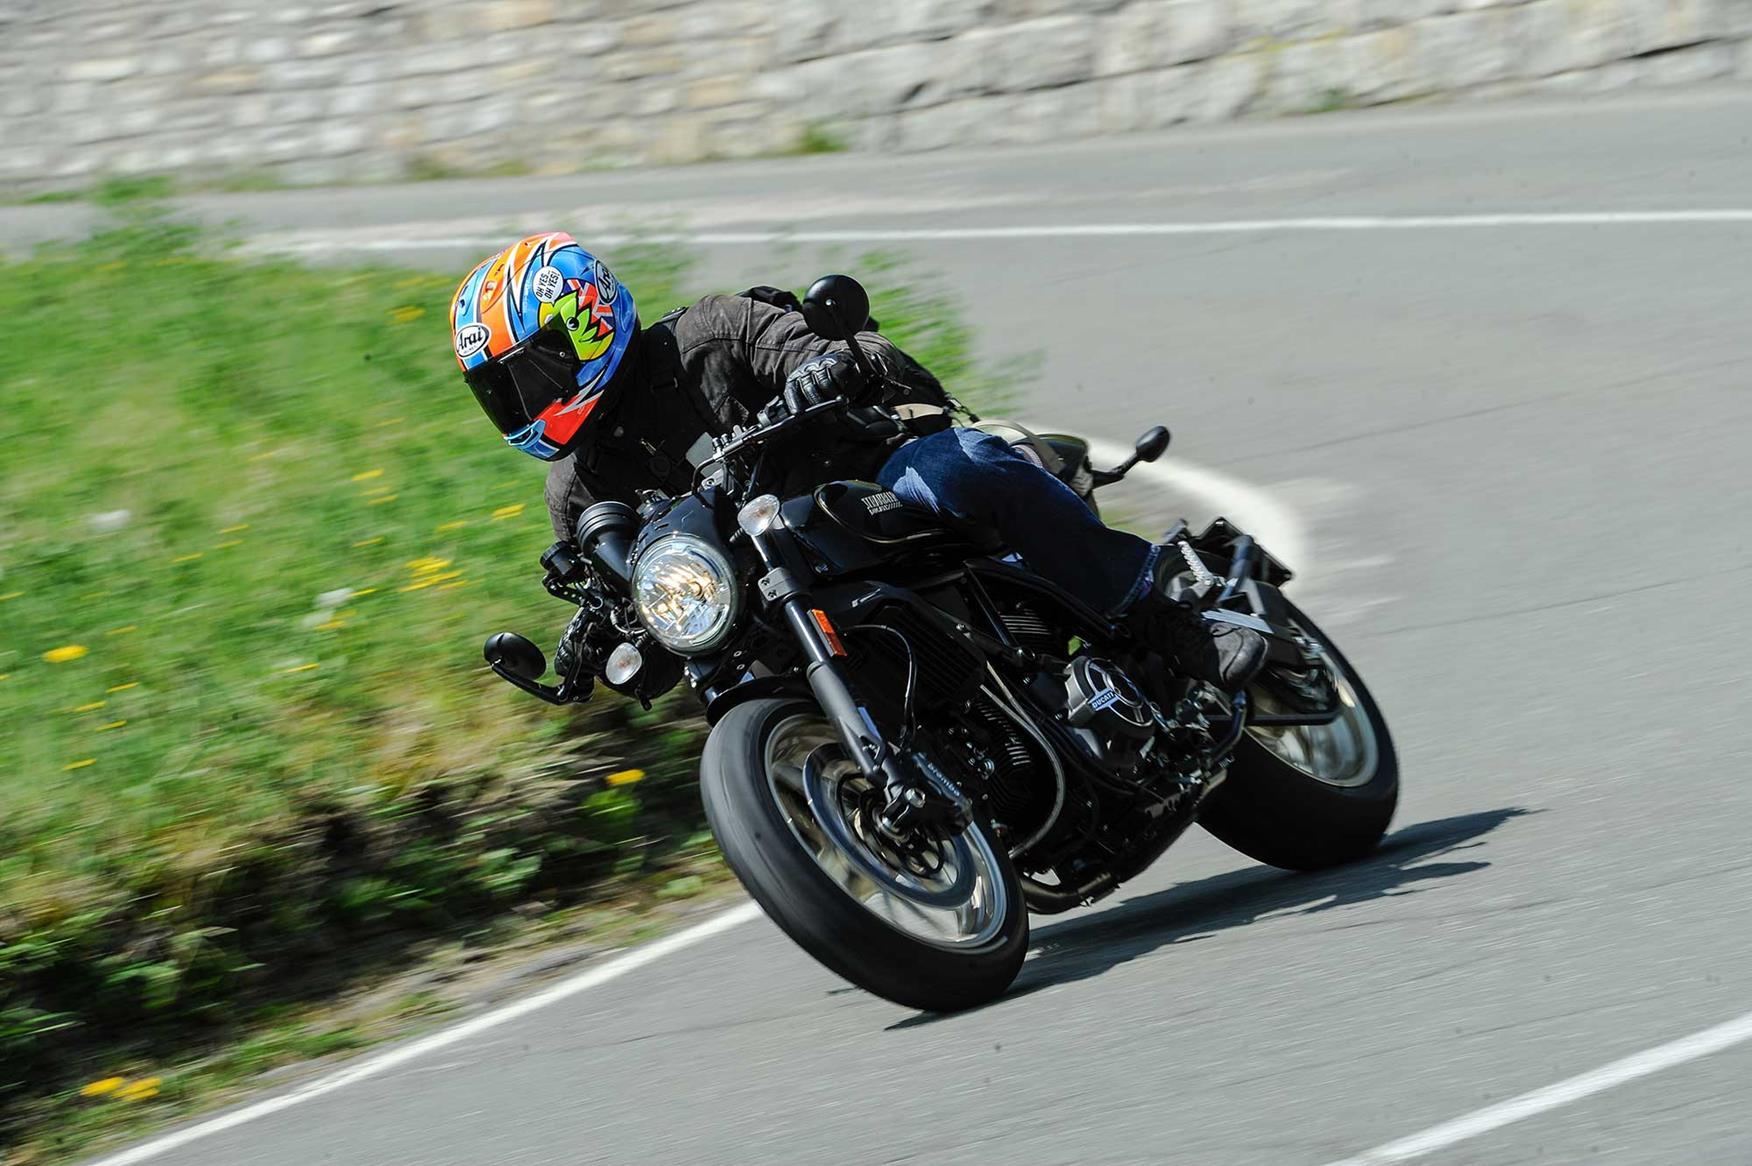 Ducati Scrambler 800 Cafe Racer 2017 On Review